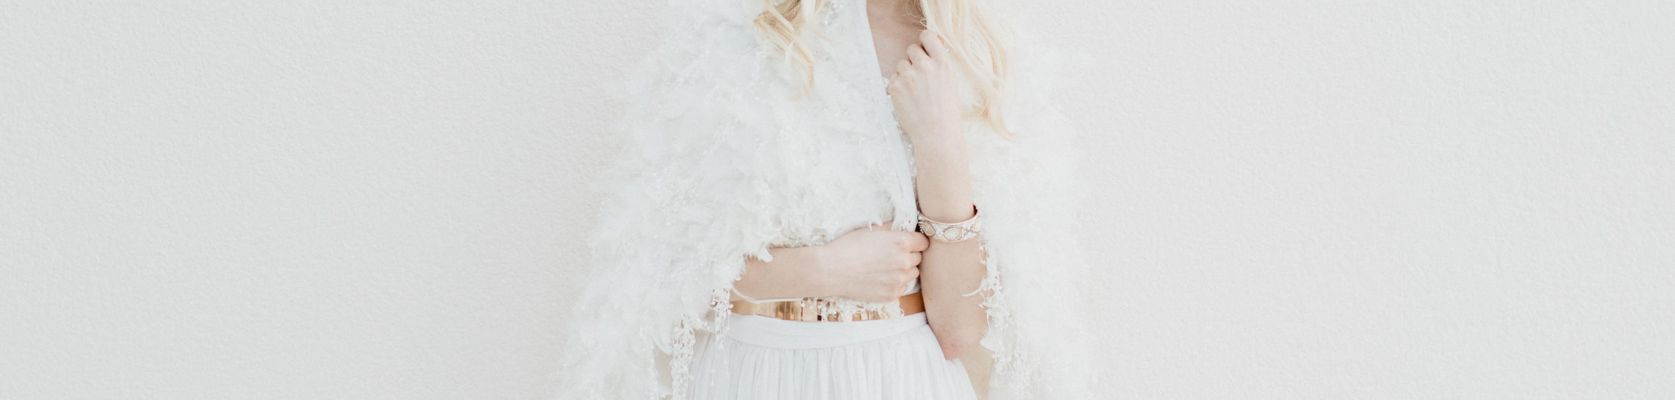 Kollektion, Brautkollektion, Hochzeitskollektion, Brautkleidkollektion, Modekollektion